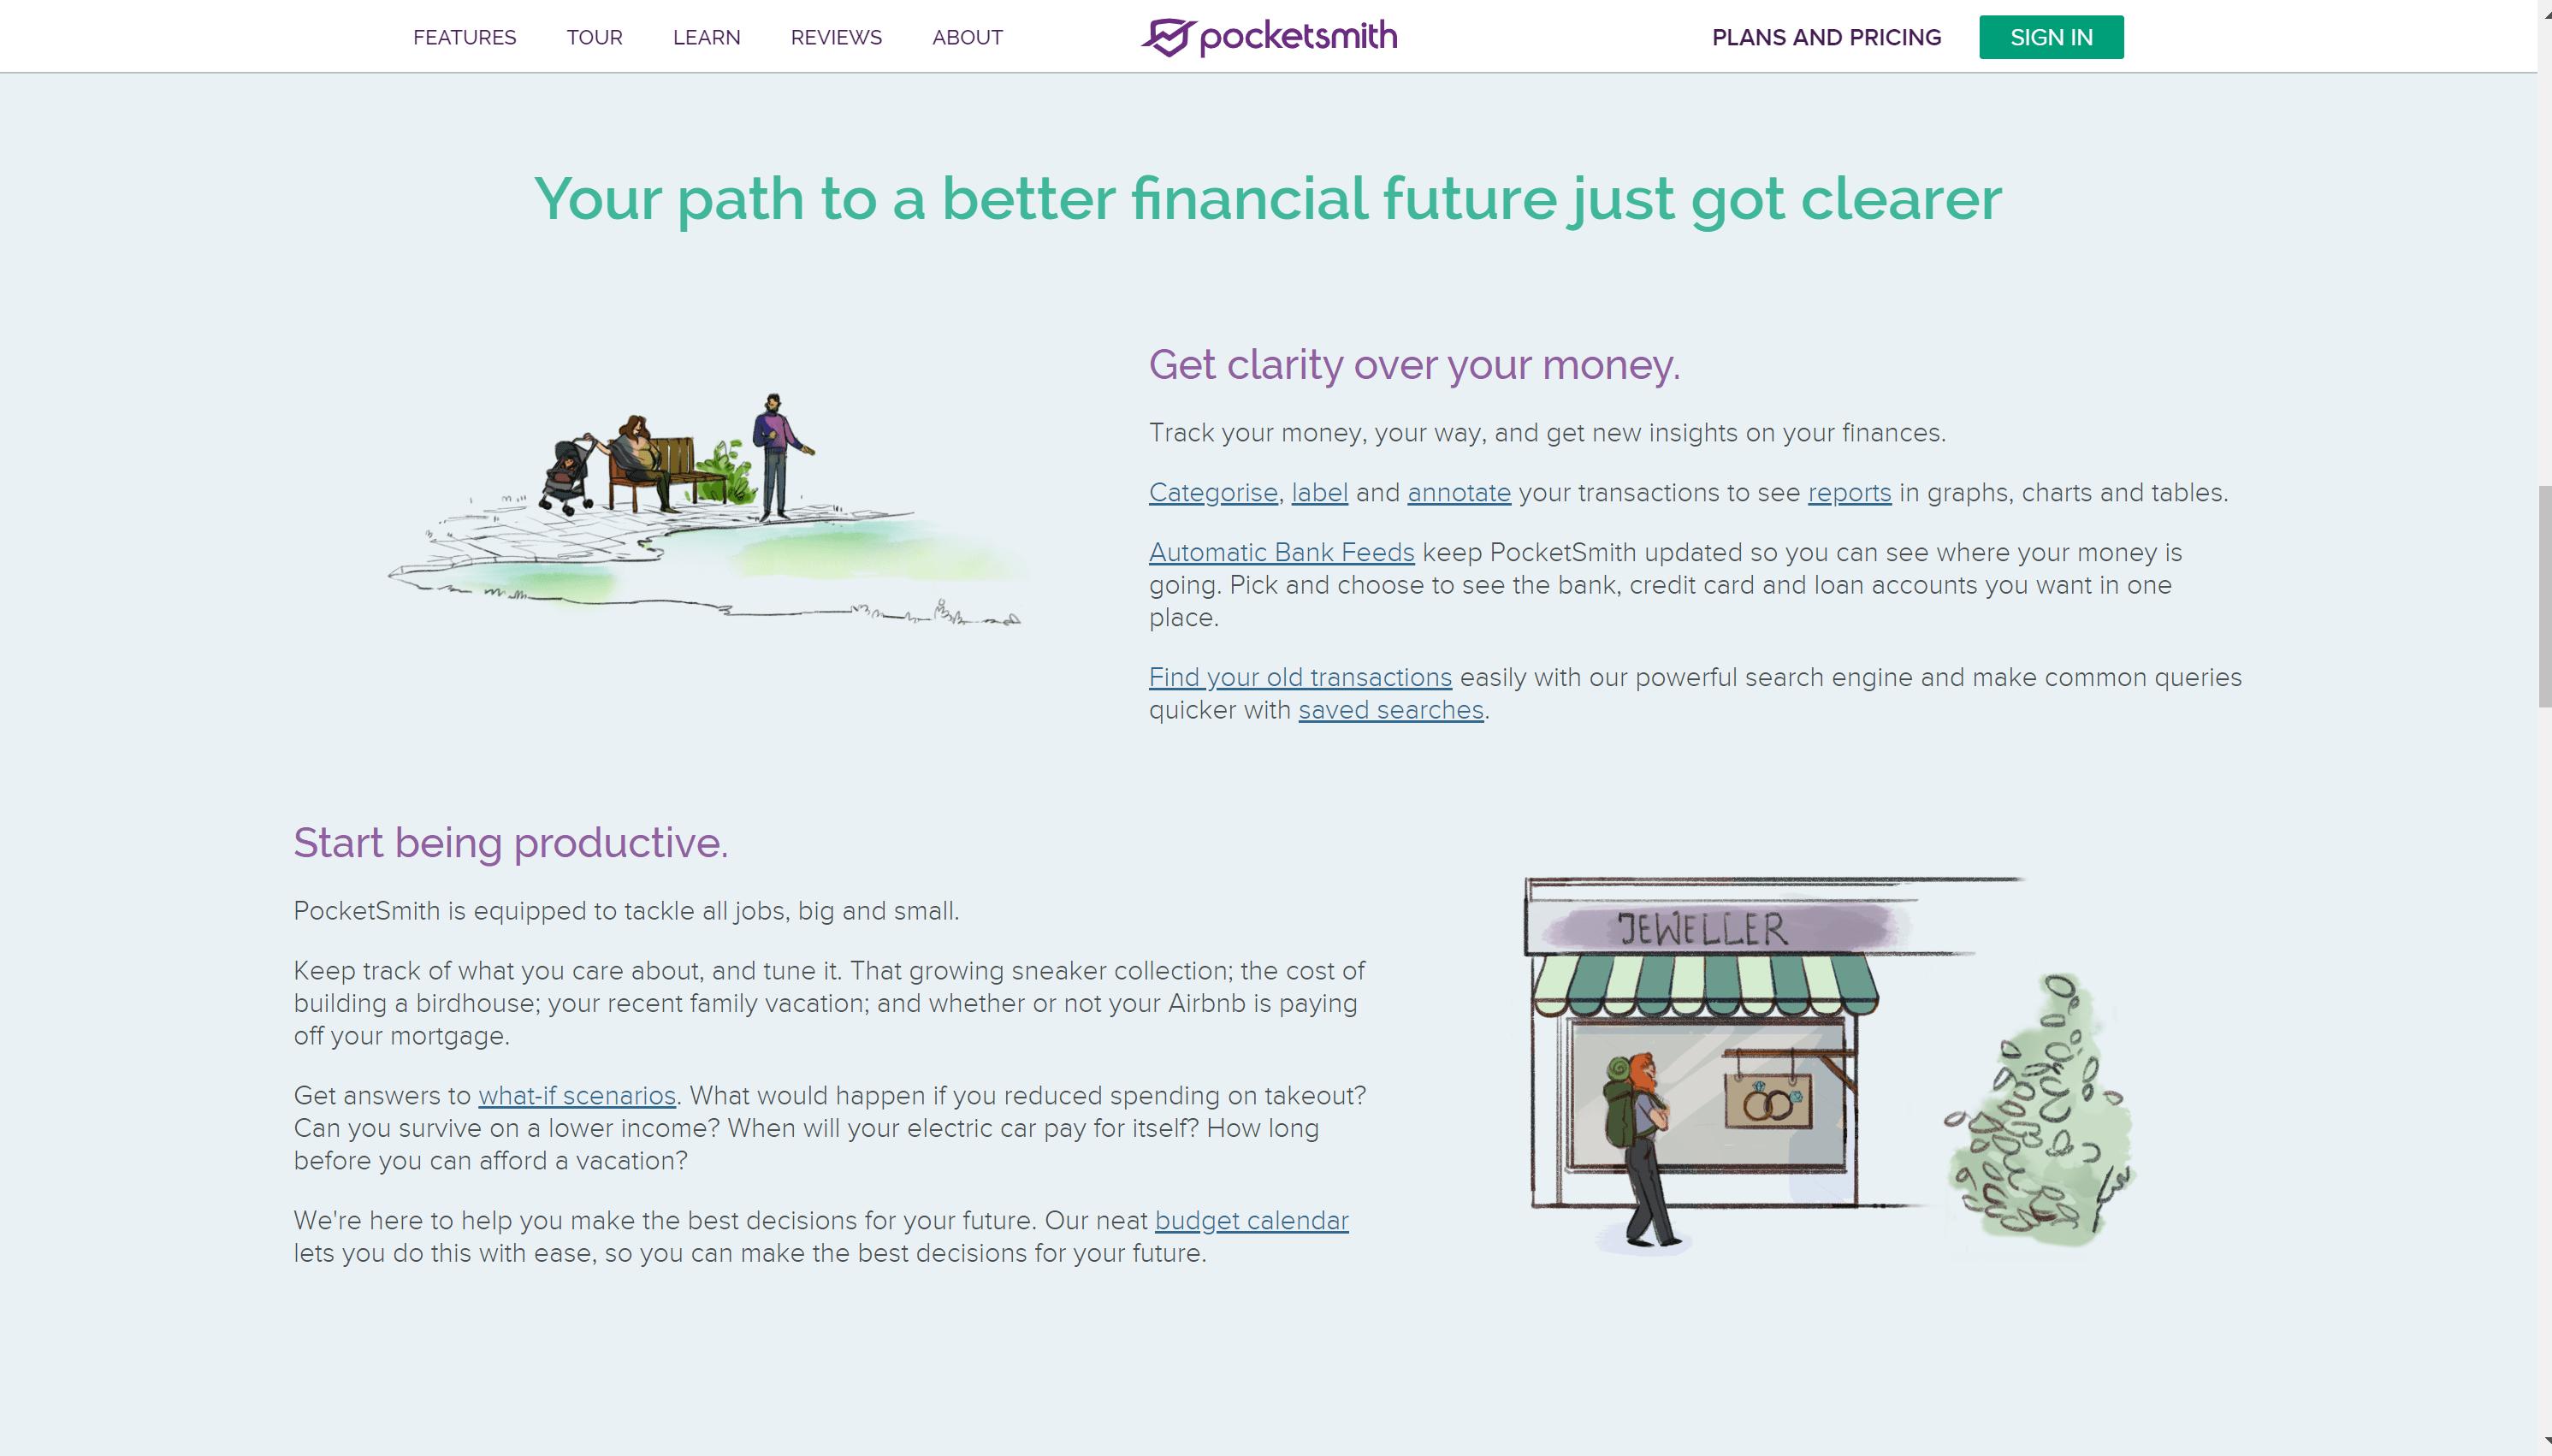 Why choose poscketsmith